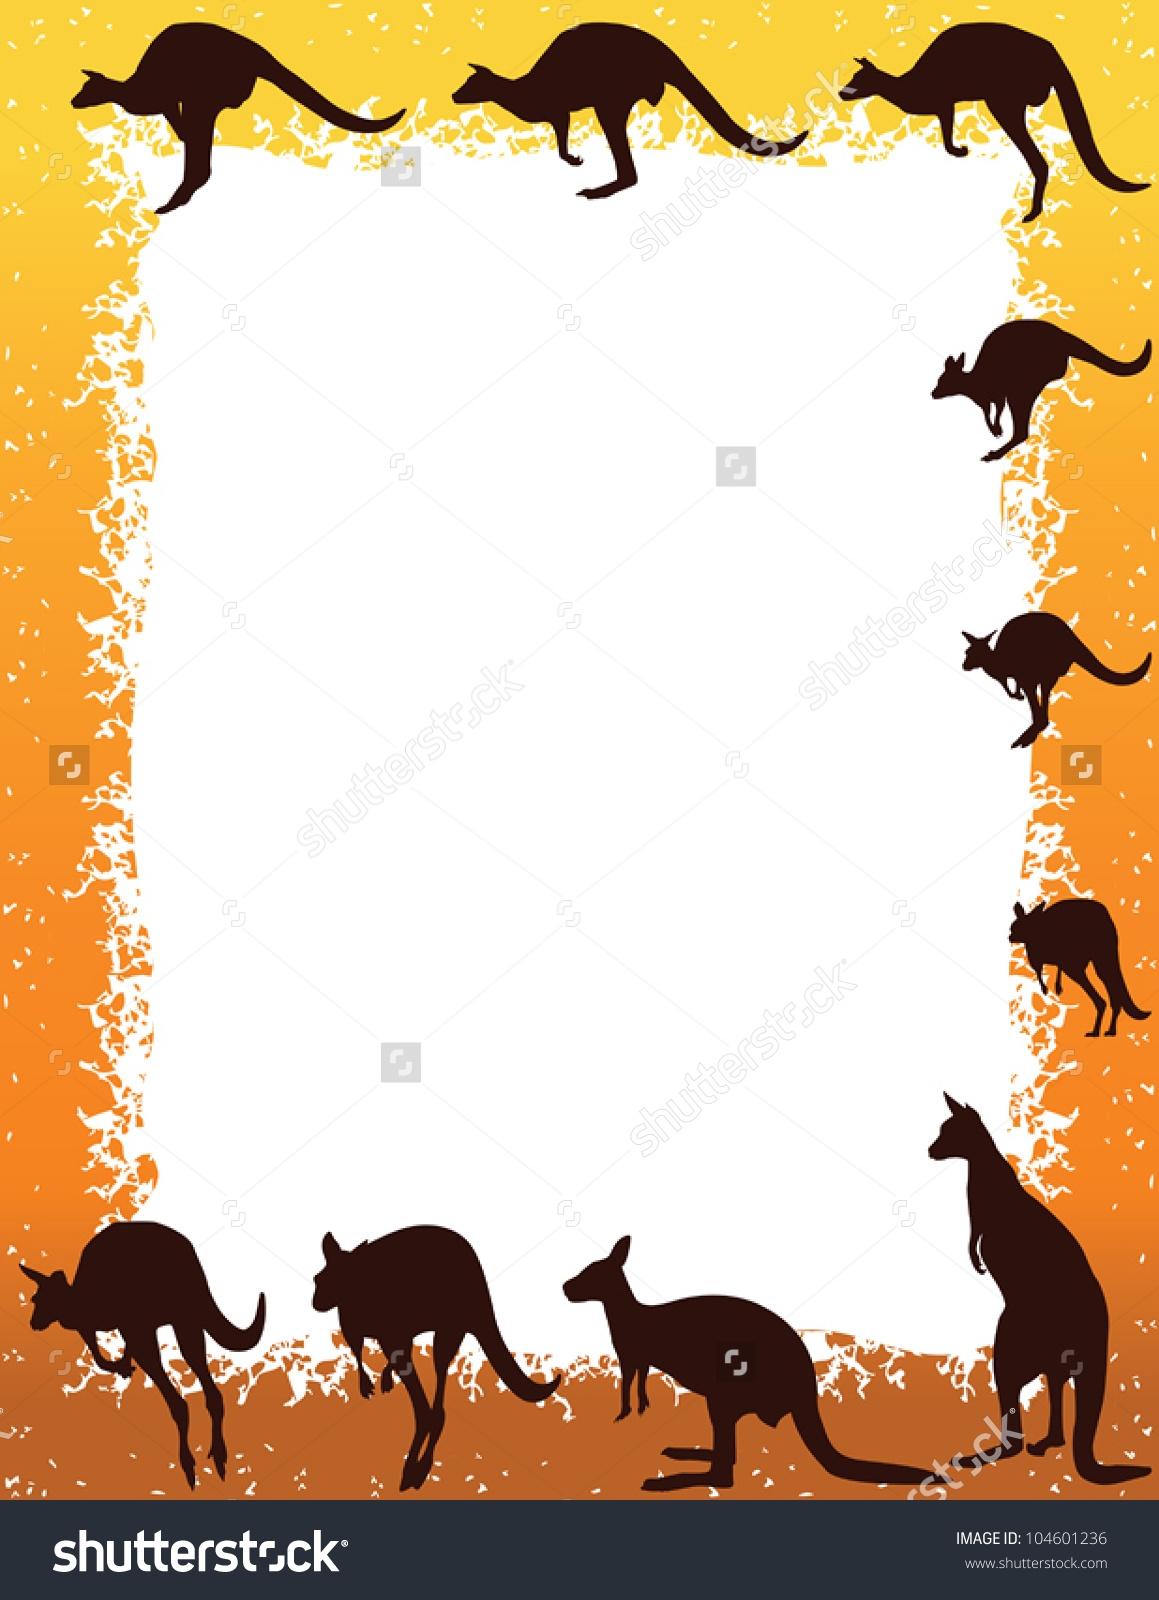 Kangaroo Border Clipart.